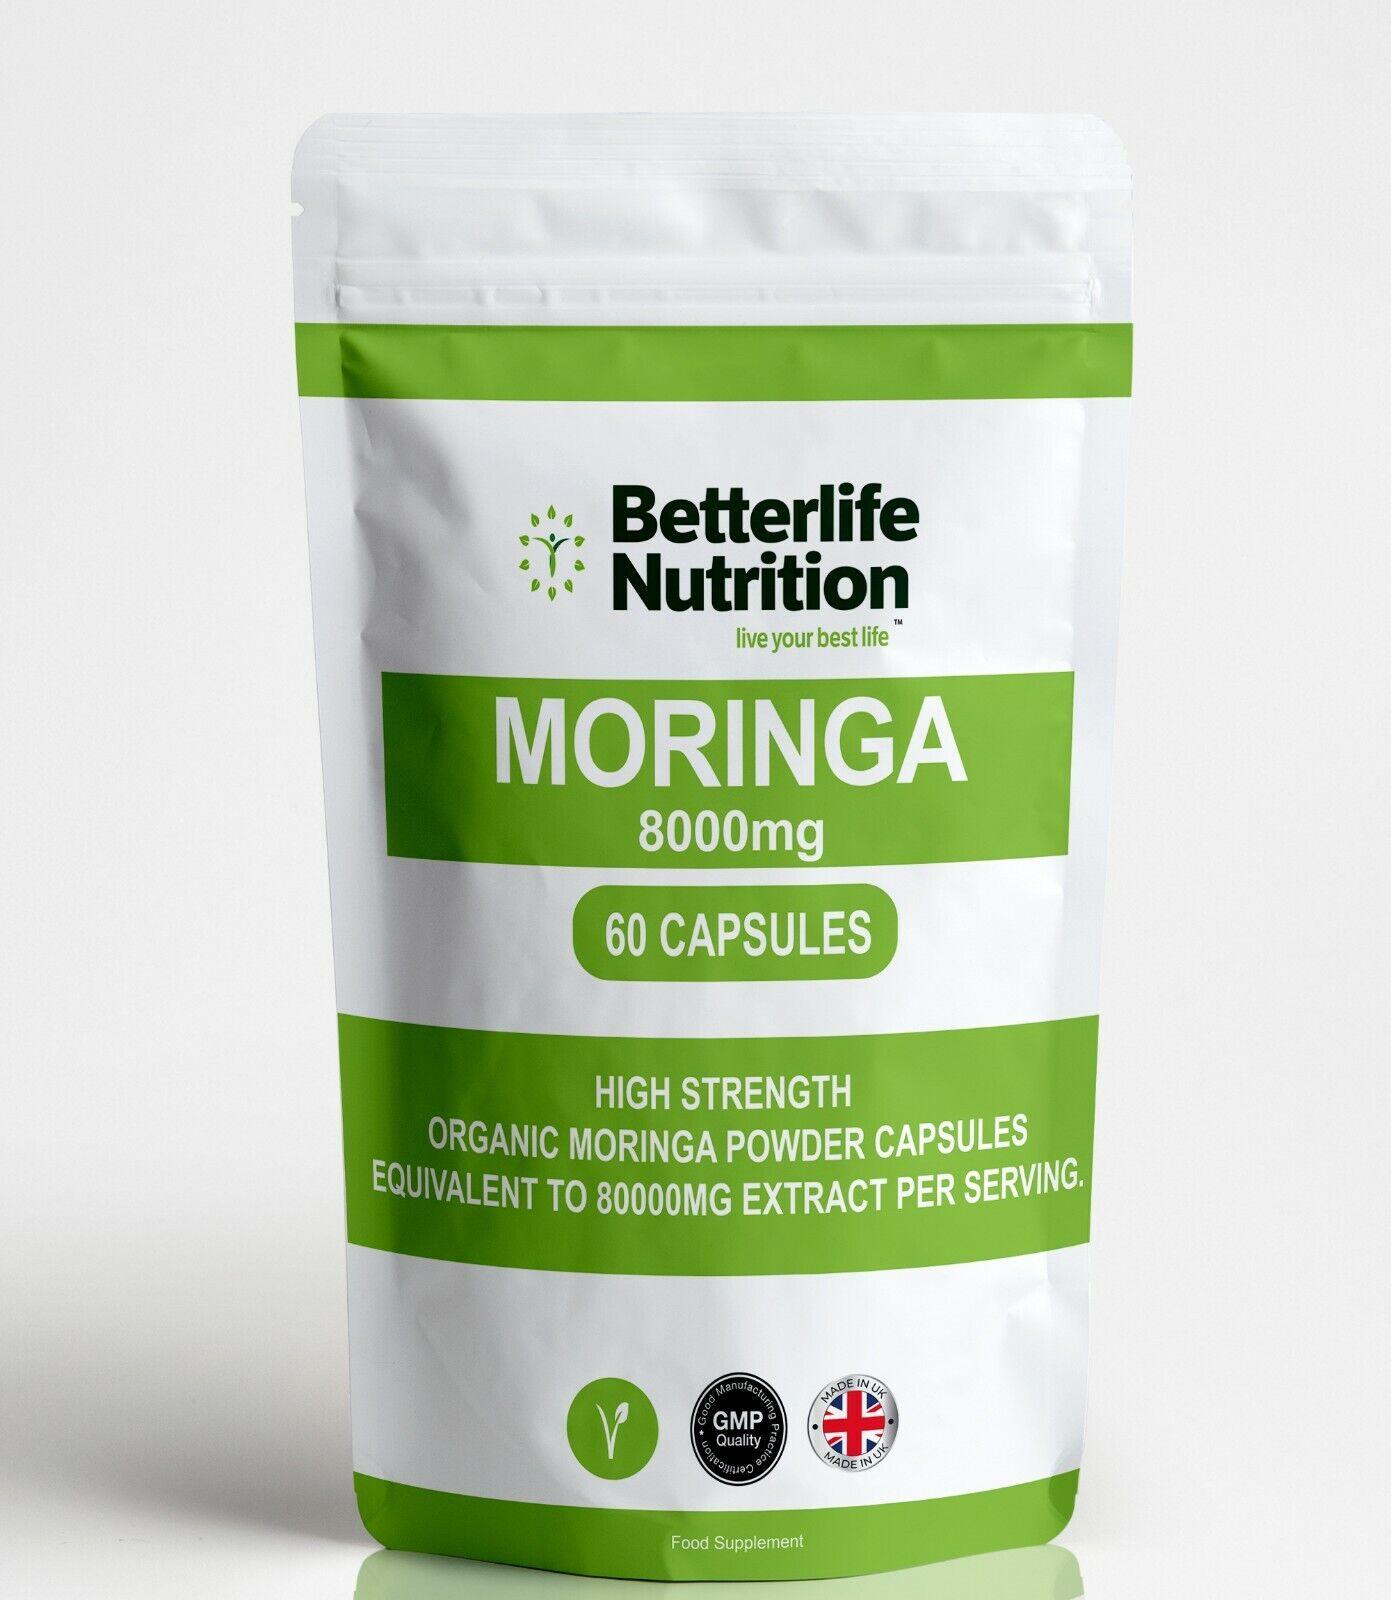 Moringa Organic Capsules 8000mg High Strength Vegan Superfood Extract